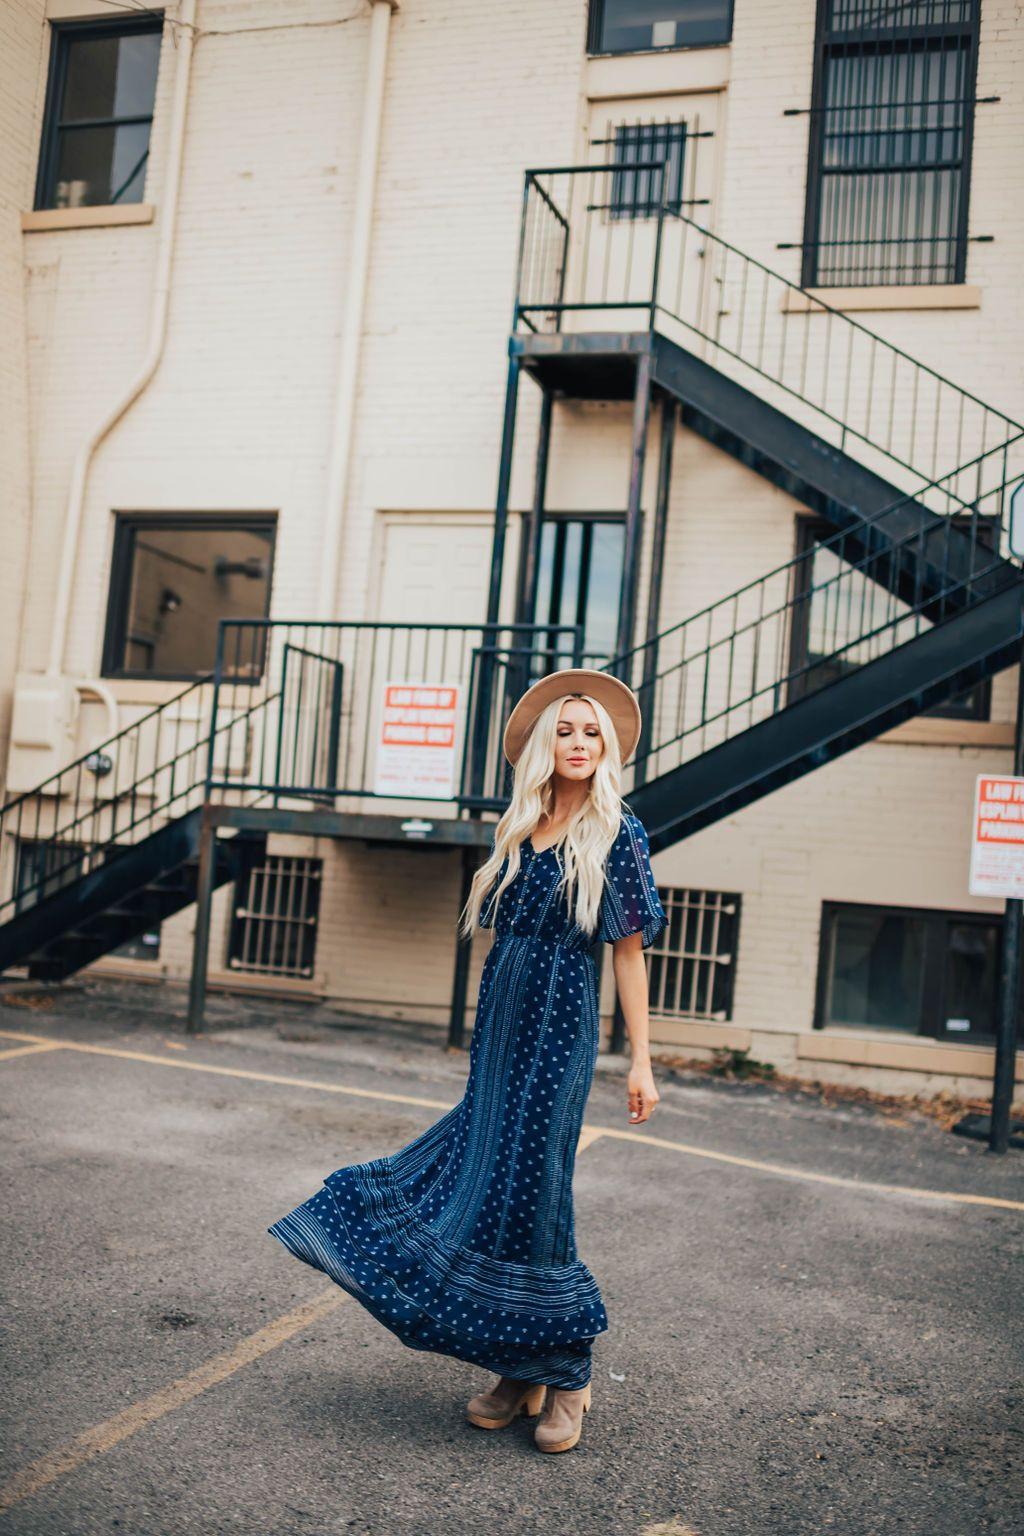 Affordable-Winter-Wedding-Guest-Dresses-2018-Under-$50-11